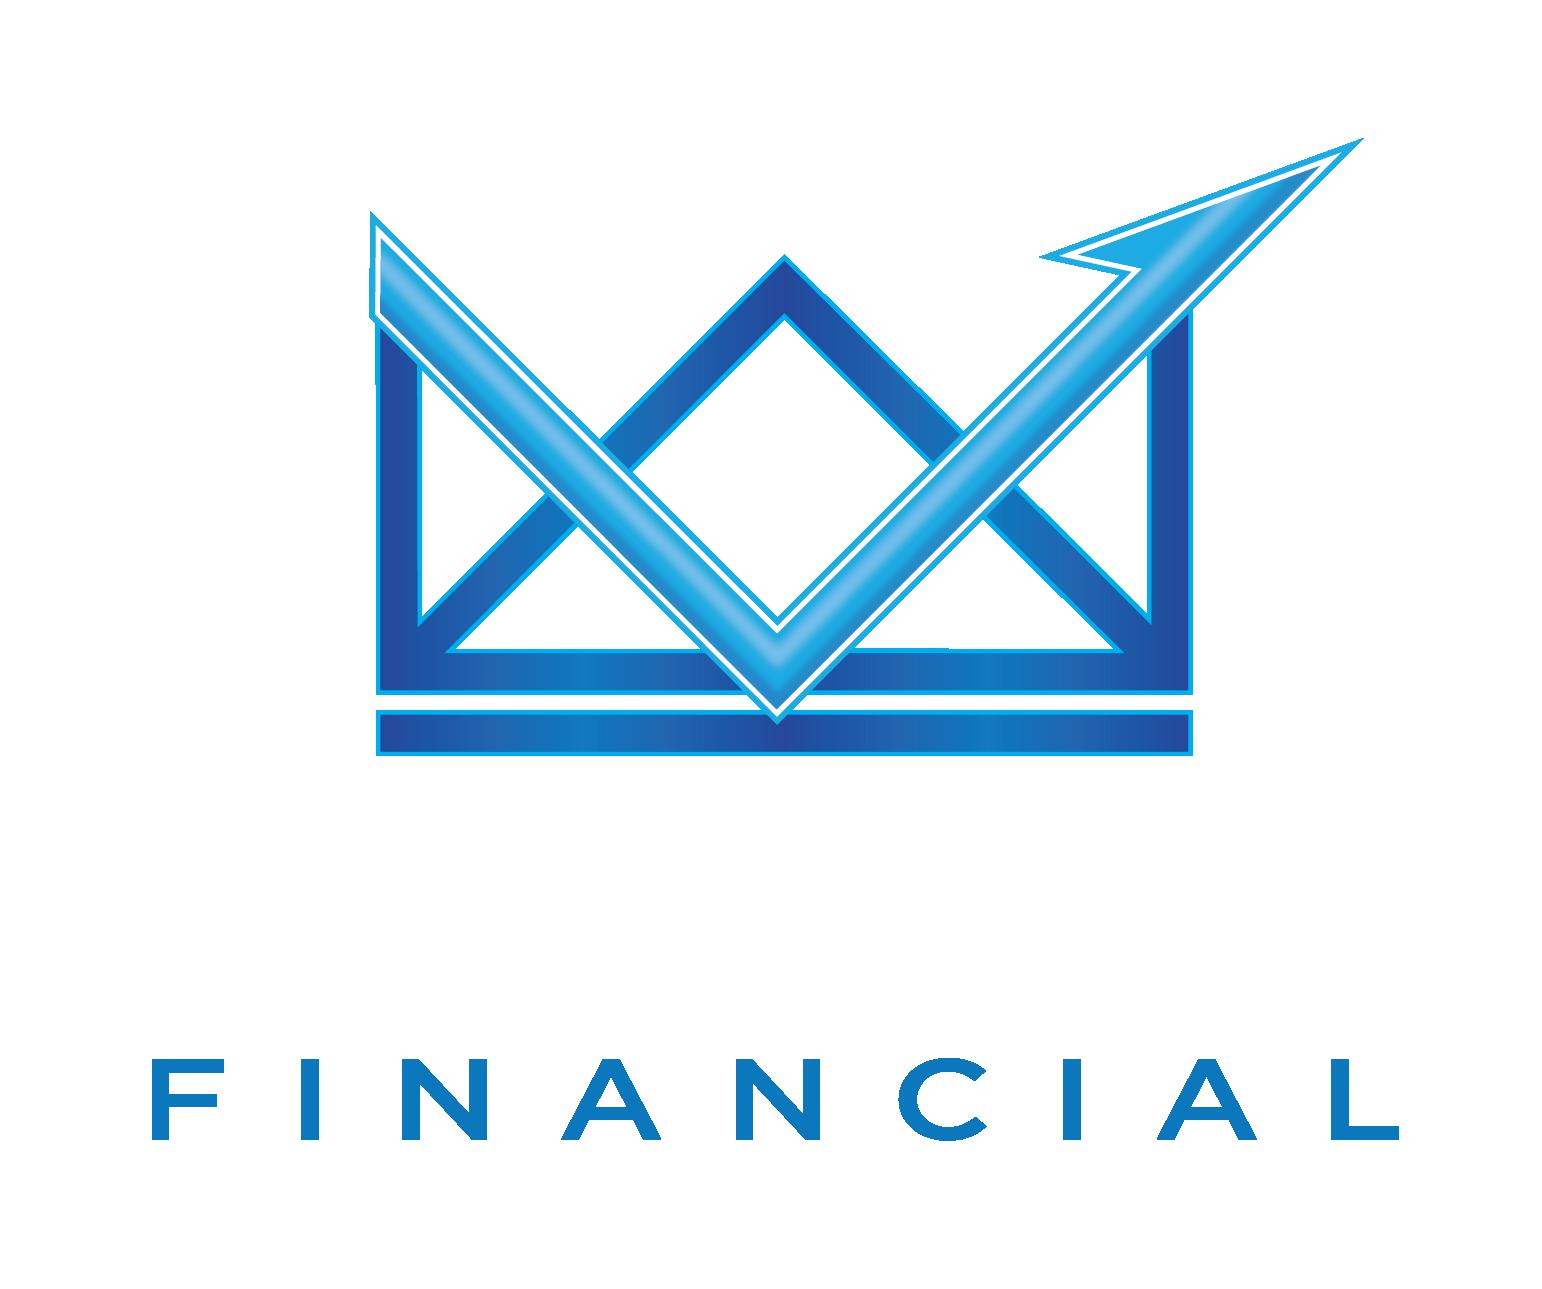 Charles Crown Financial